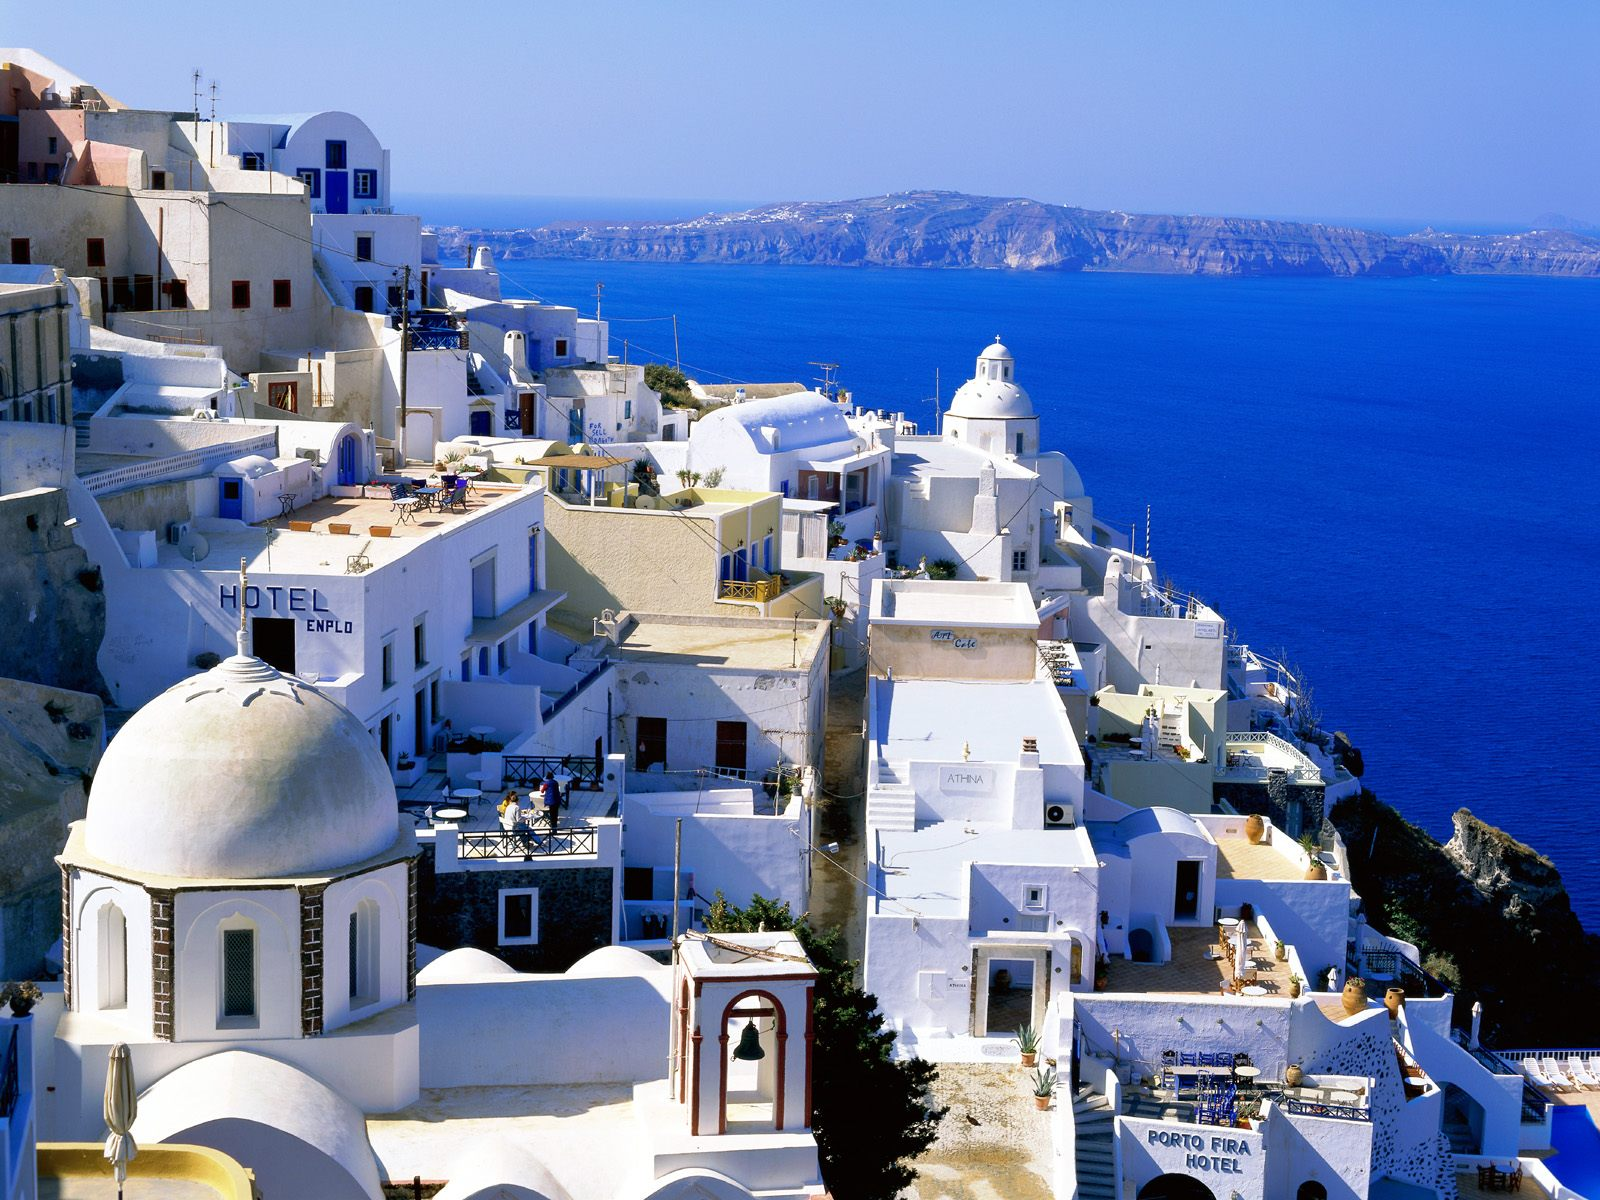 http://www.citypictures.net/data/media/226/Fira_Santorini_Cyclades_Islands_Greece.jpg